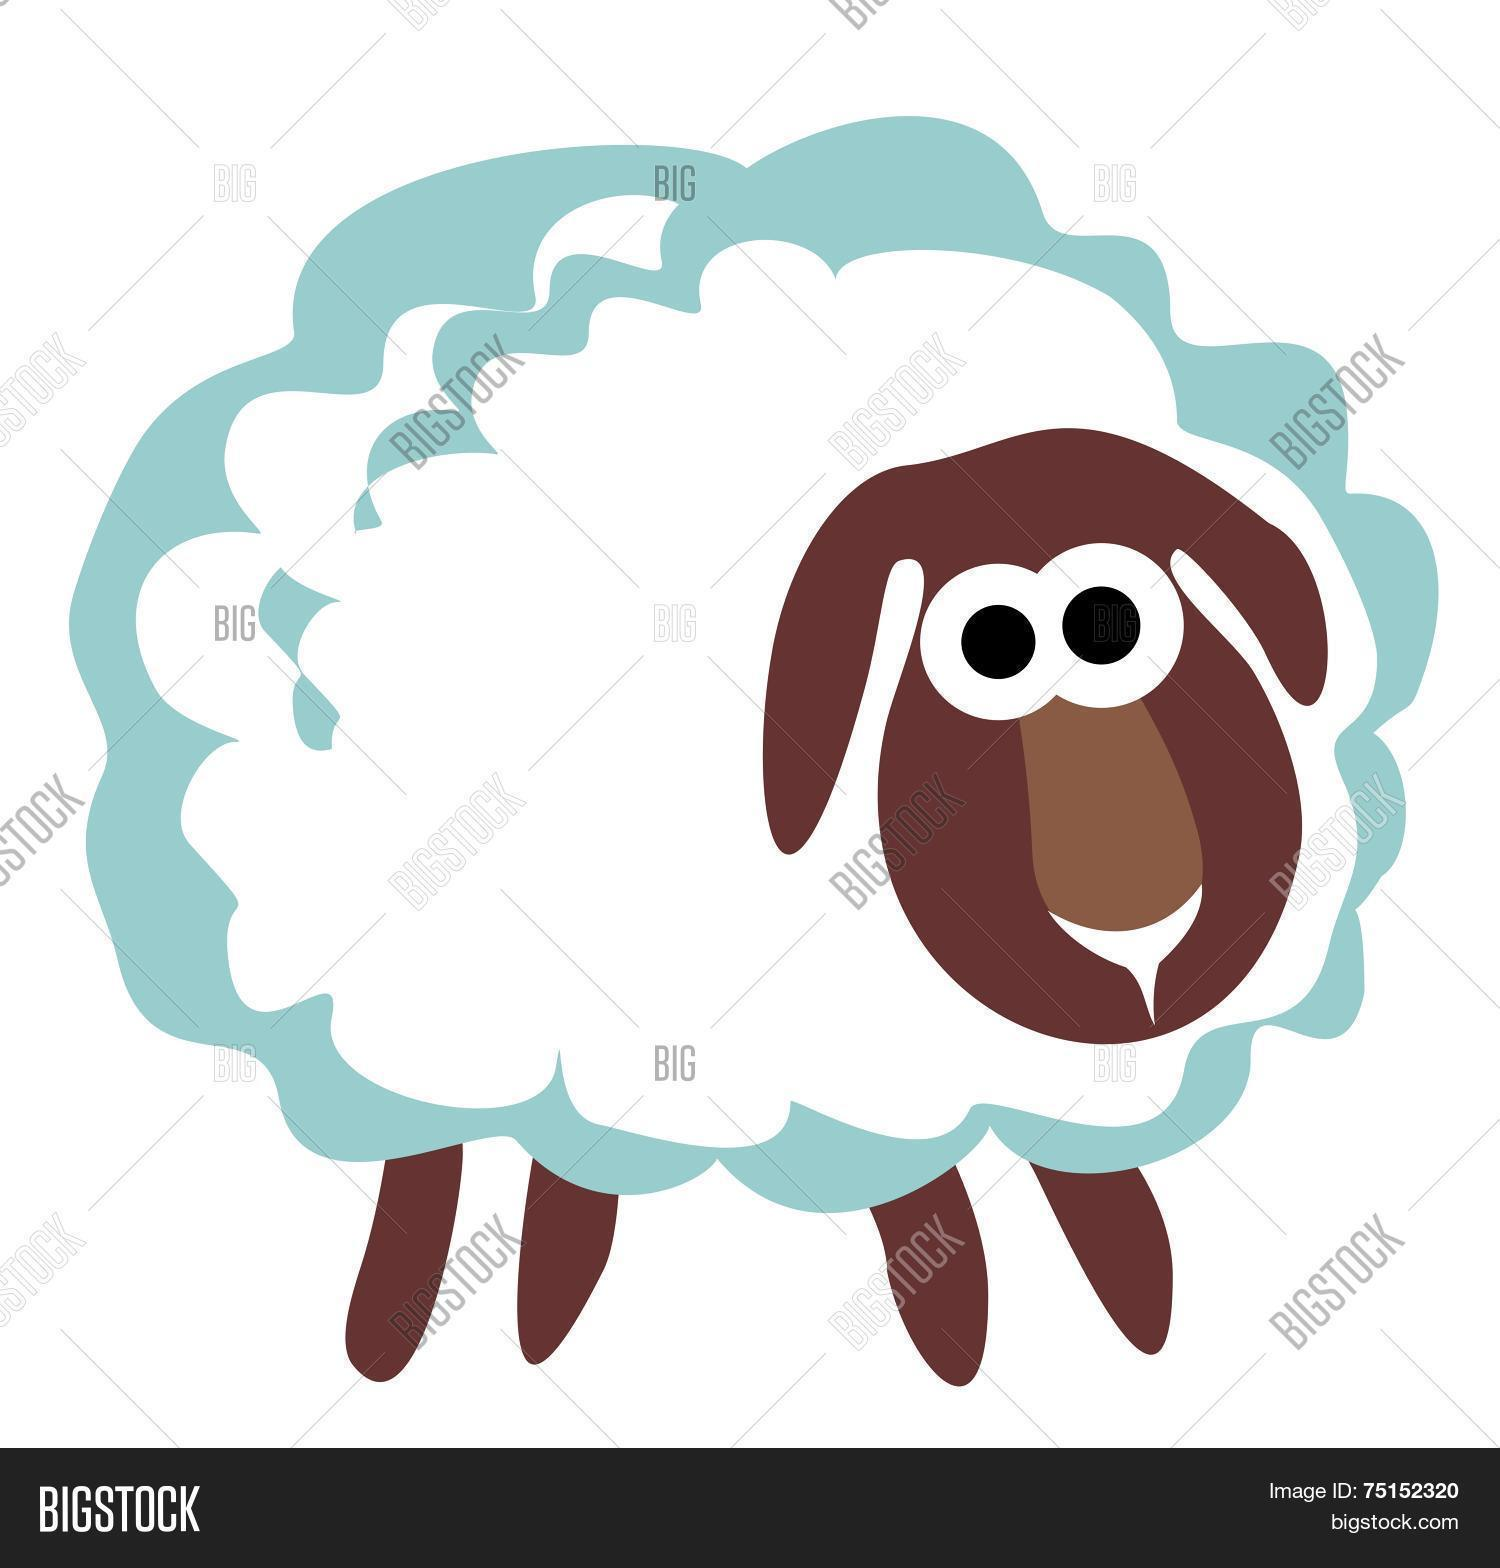 White Sheep Image & Photo (Free Trial).